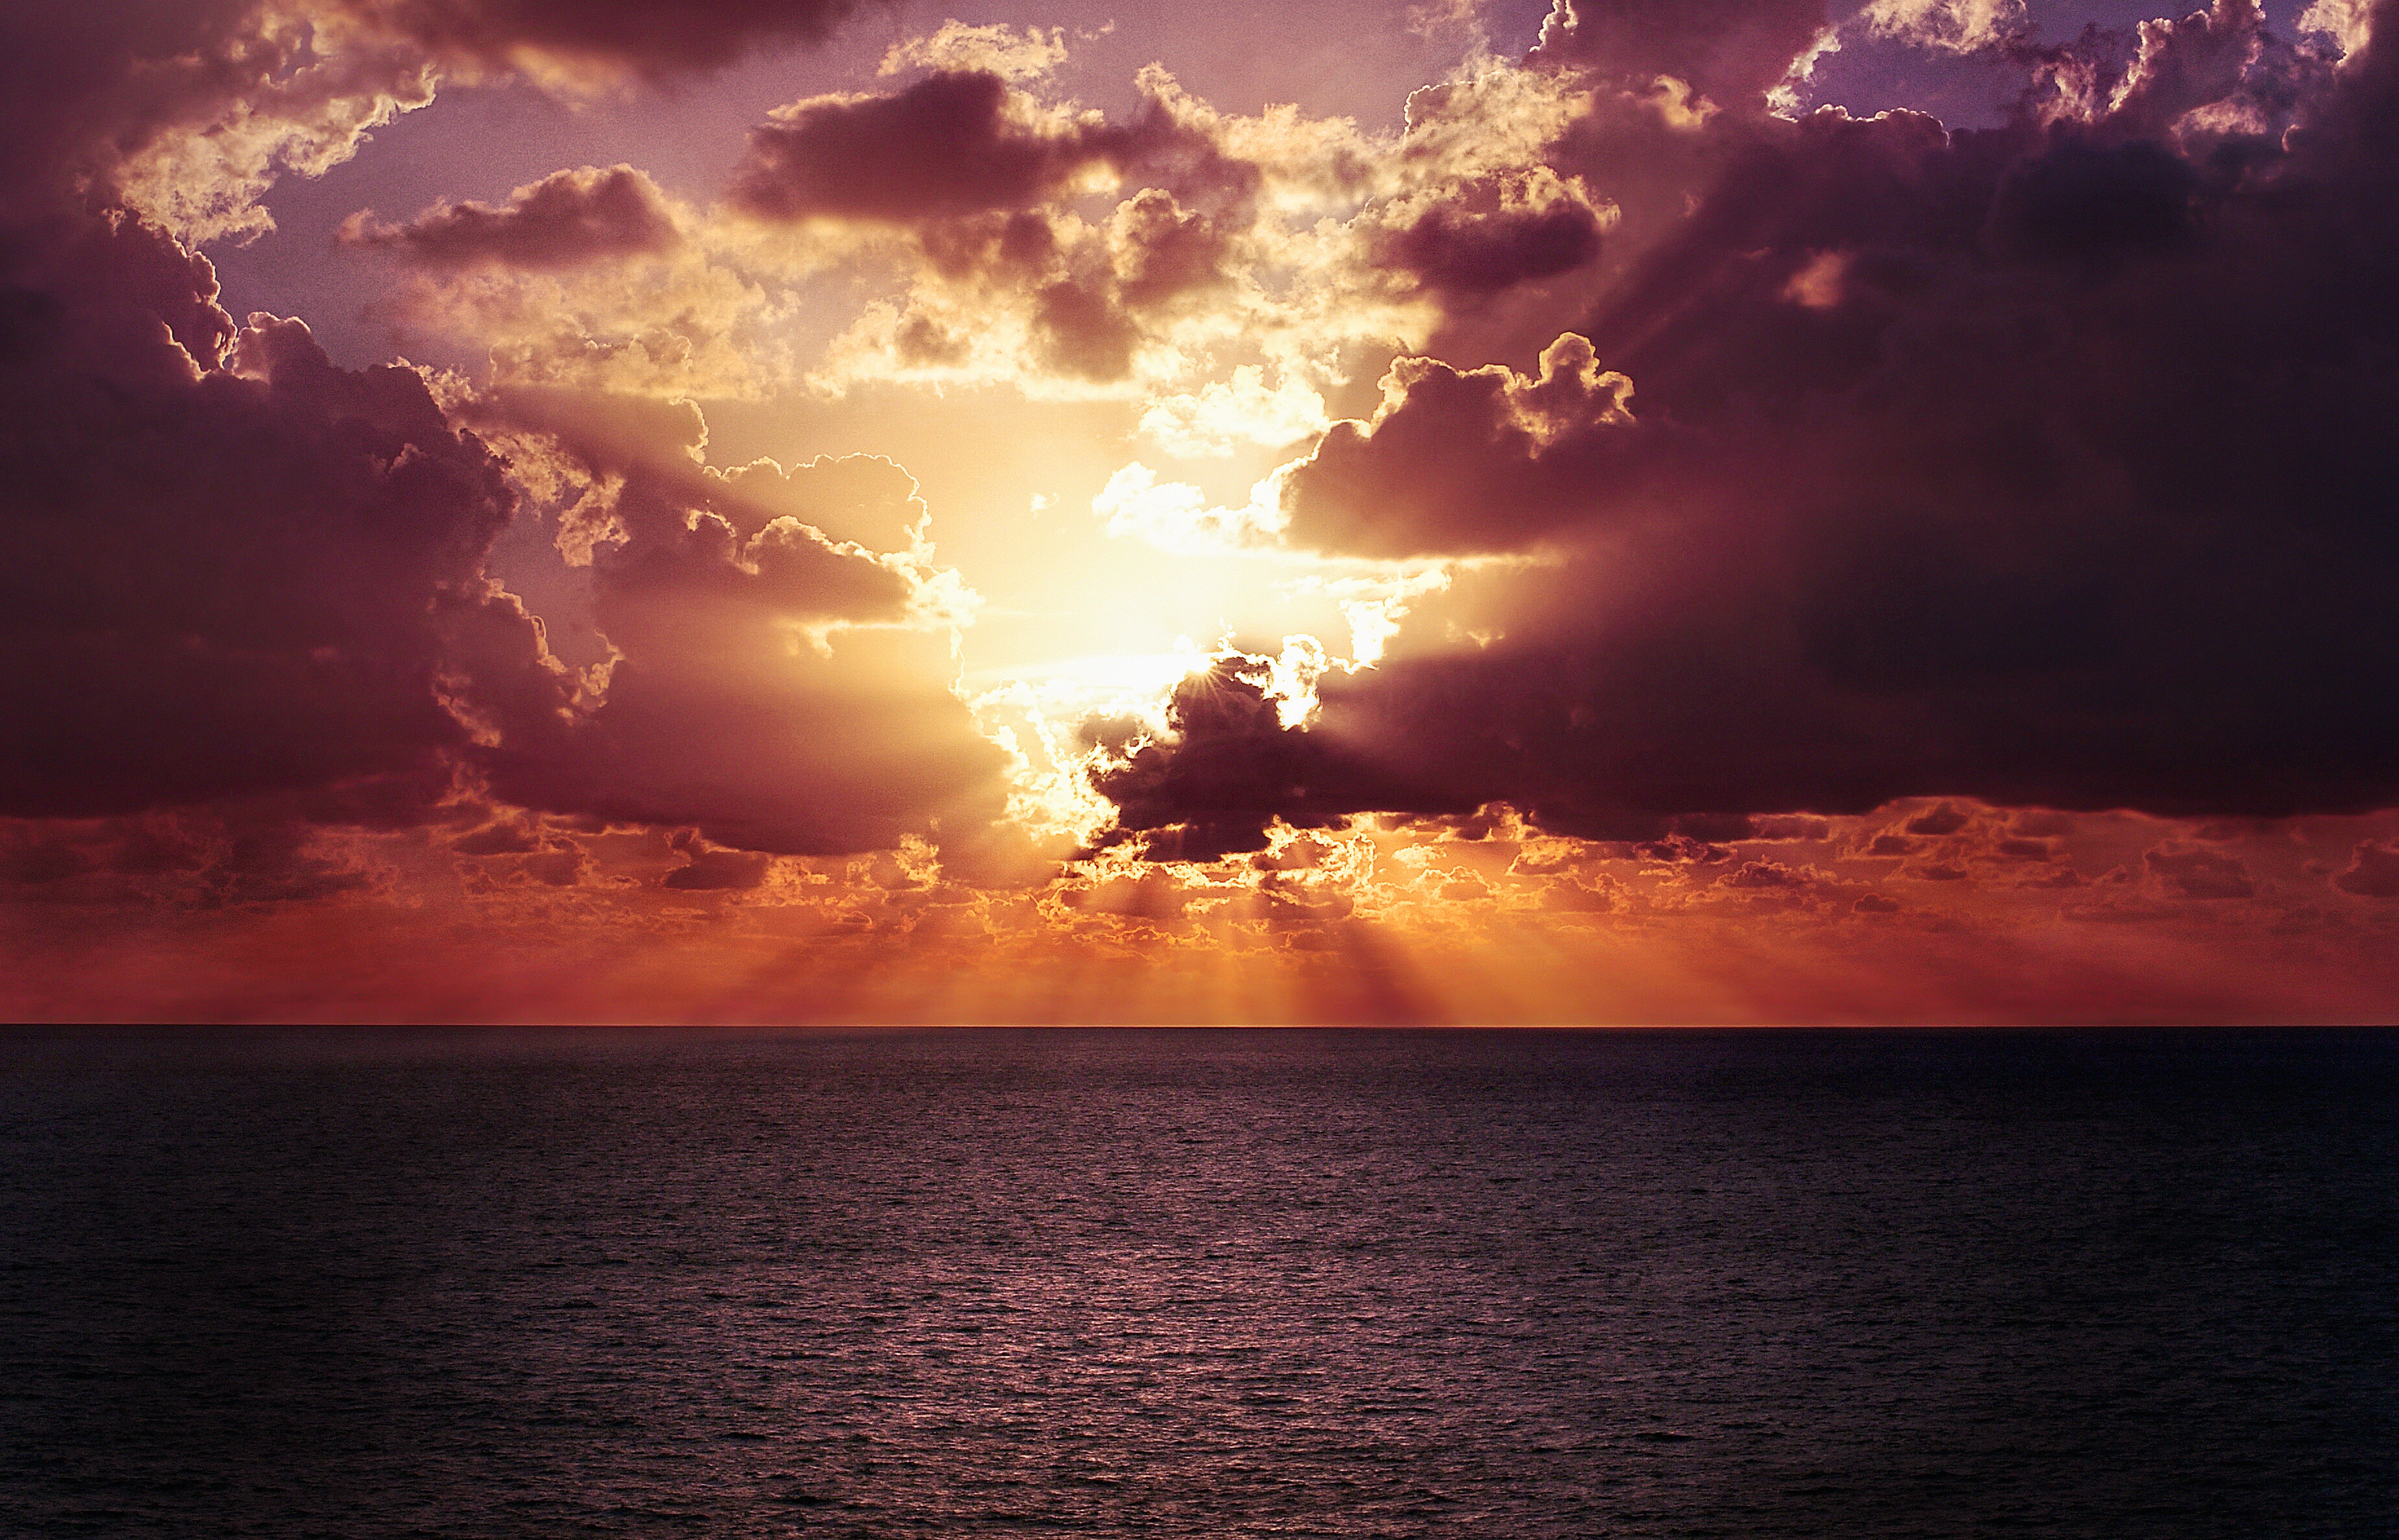 sun_rays_shining_through_clouds_during_calm_ocean_sunset_605721